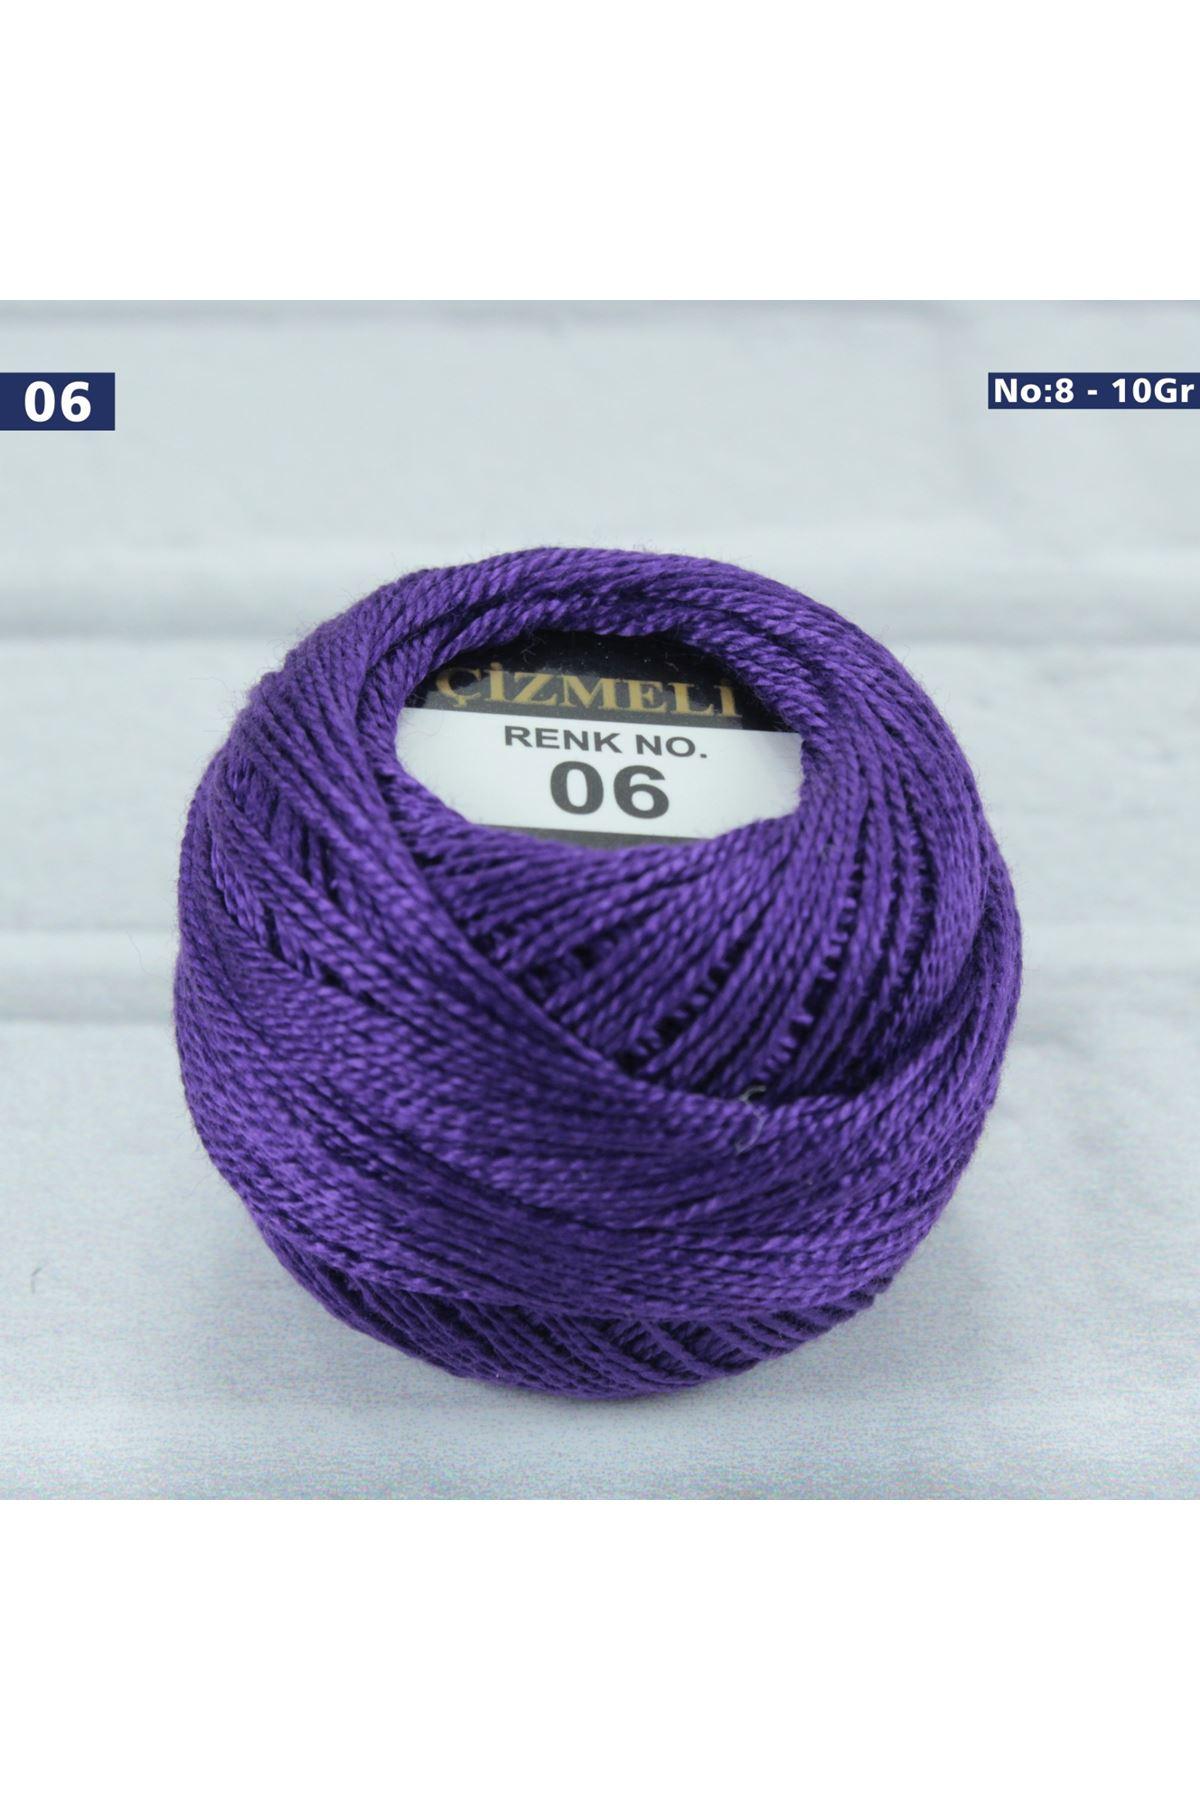 Çizmeli Cotton Perle Nakış İpliği No: 006